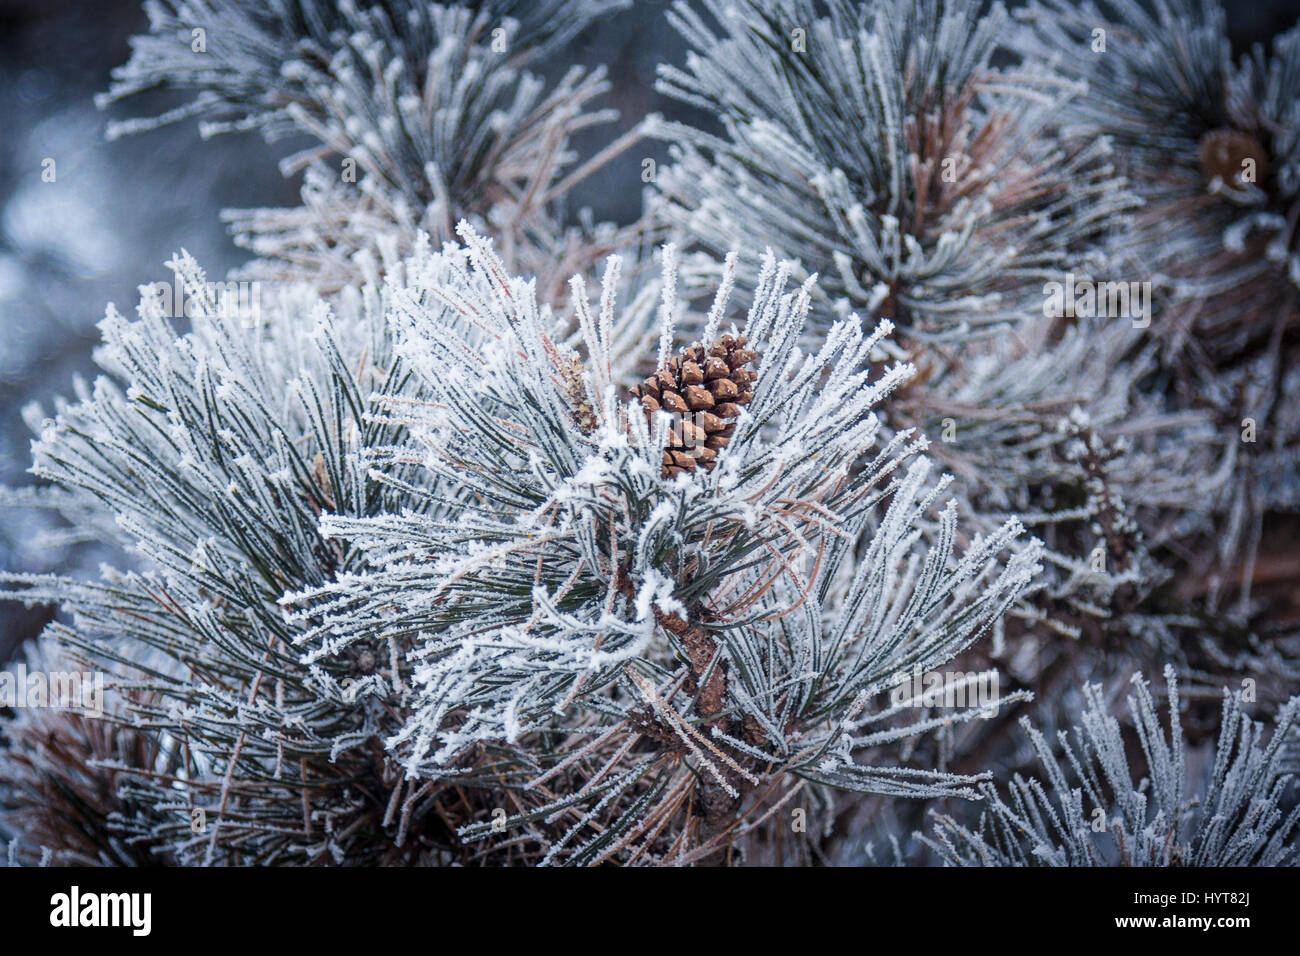 strobilus, strobili, plants, Pinophyta, conifers,  reproductive, woody, seeds, herbaceous, microstrobilus, megastrobilus, - Stock Image